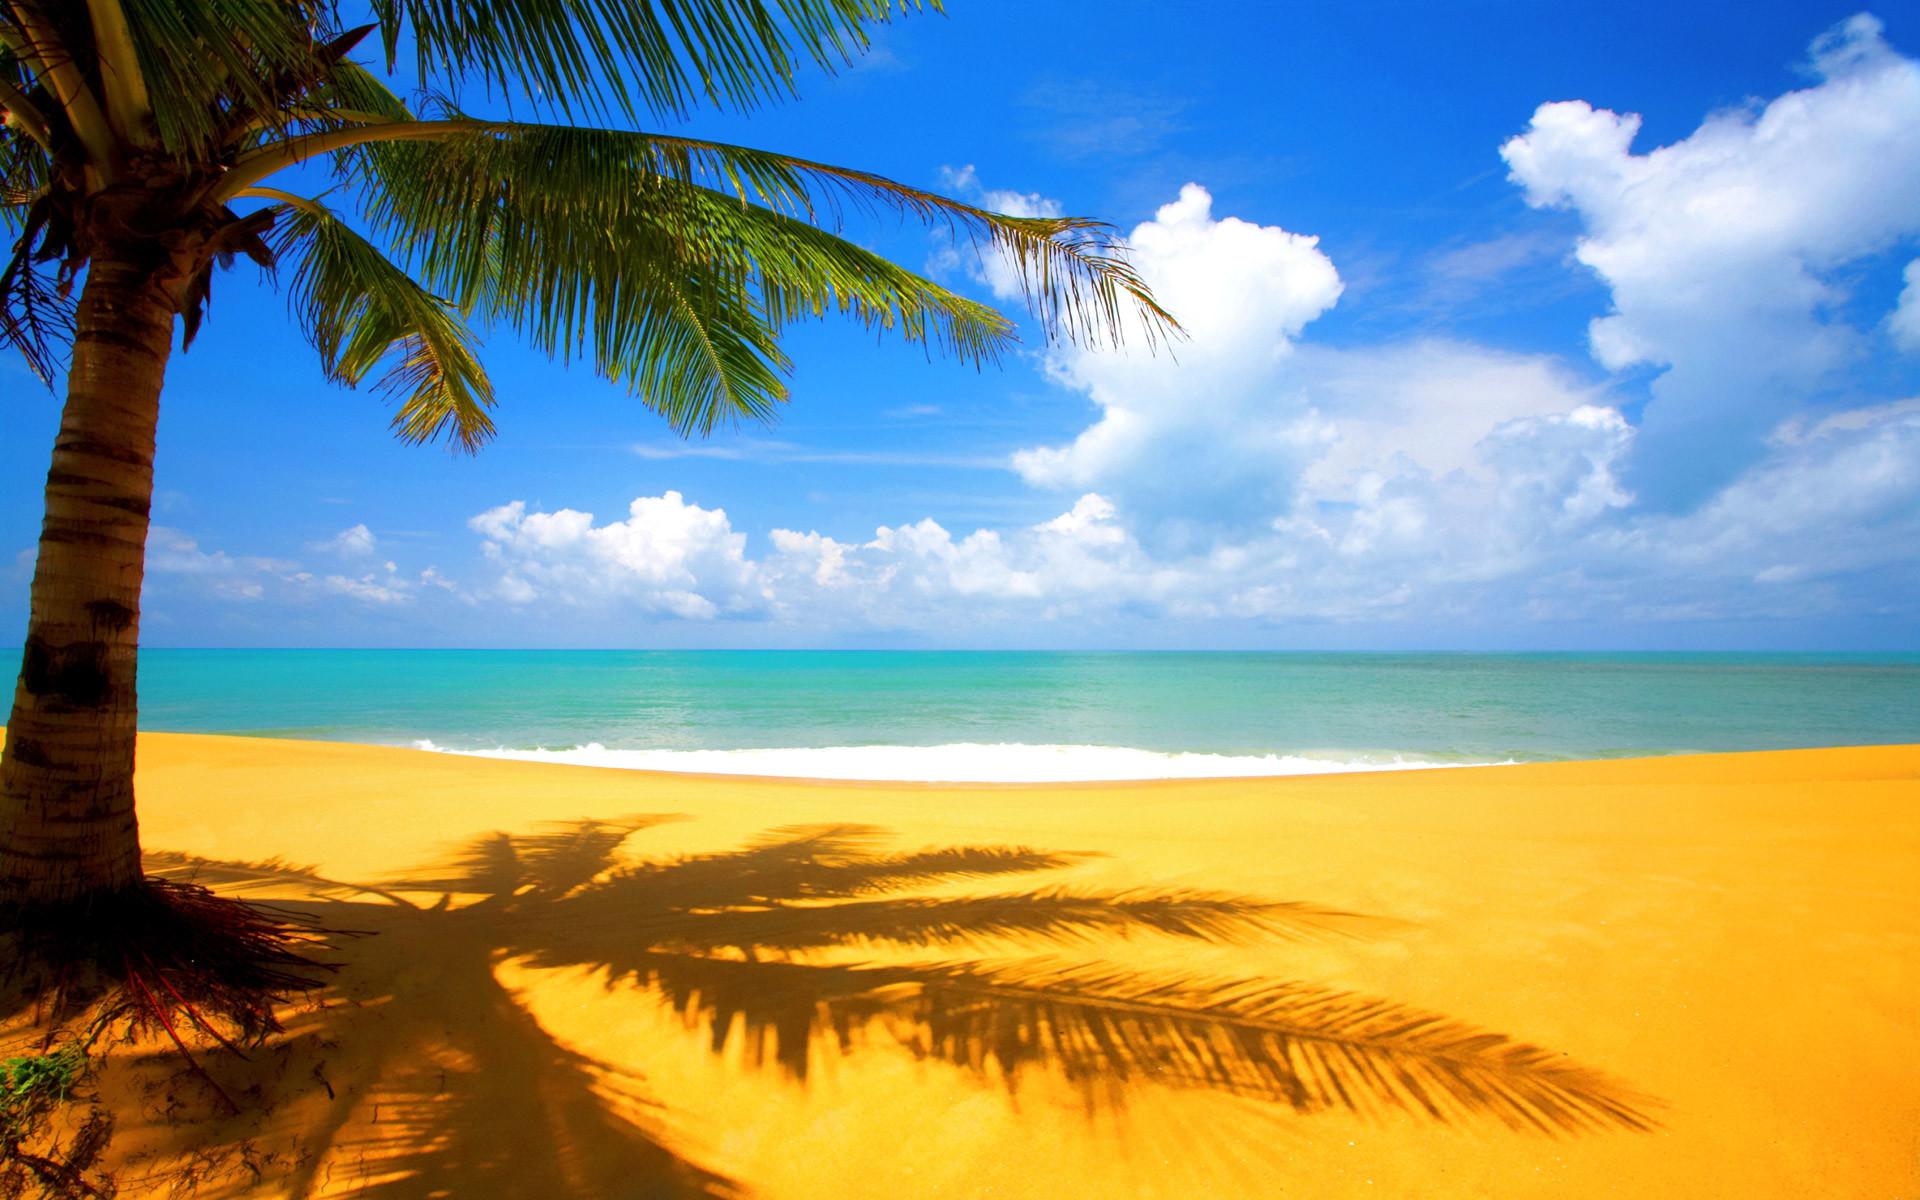 Wallpaper Of Beach Scenery: A Beautiful Shadow Of Palm Near Beach .